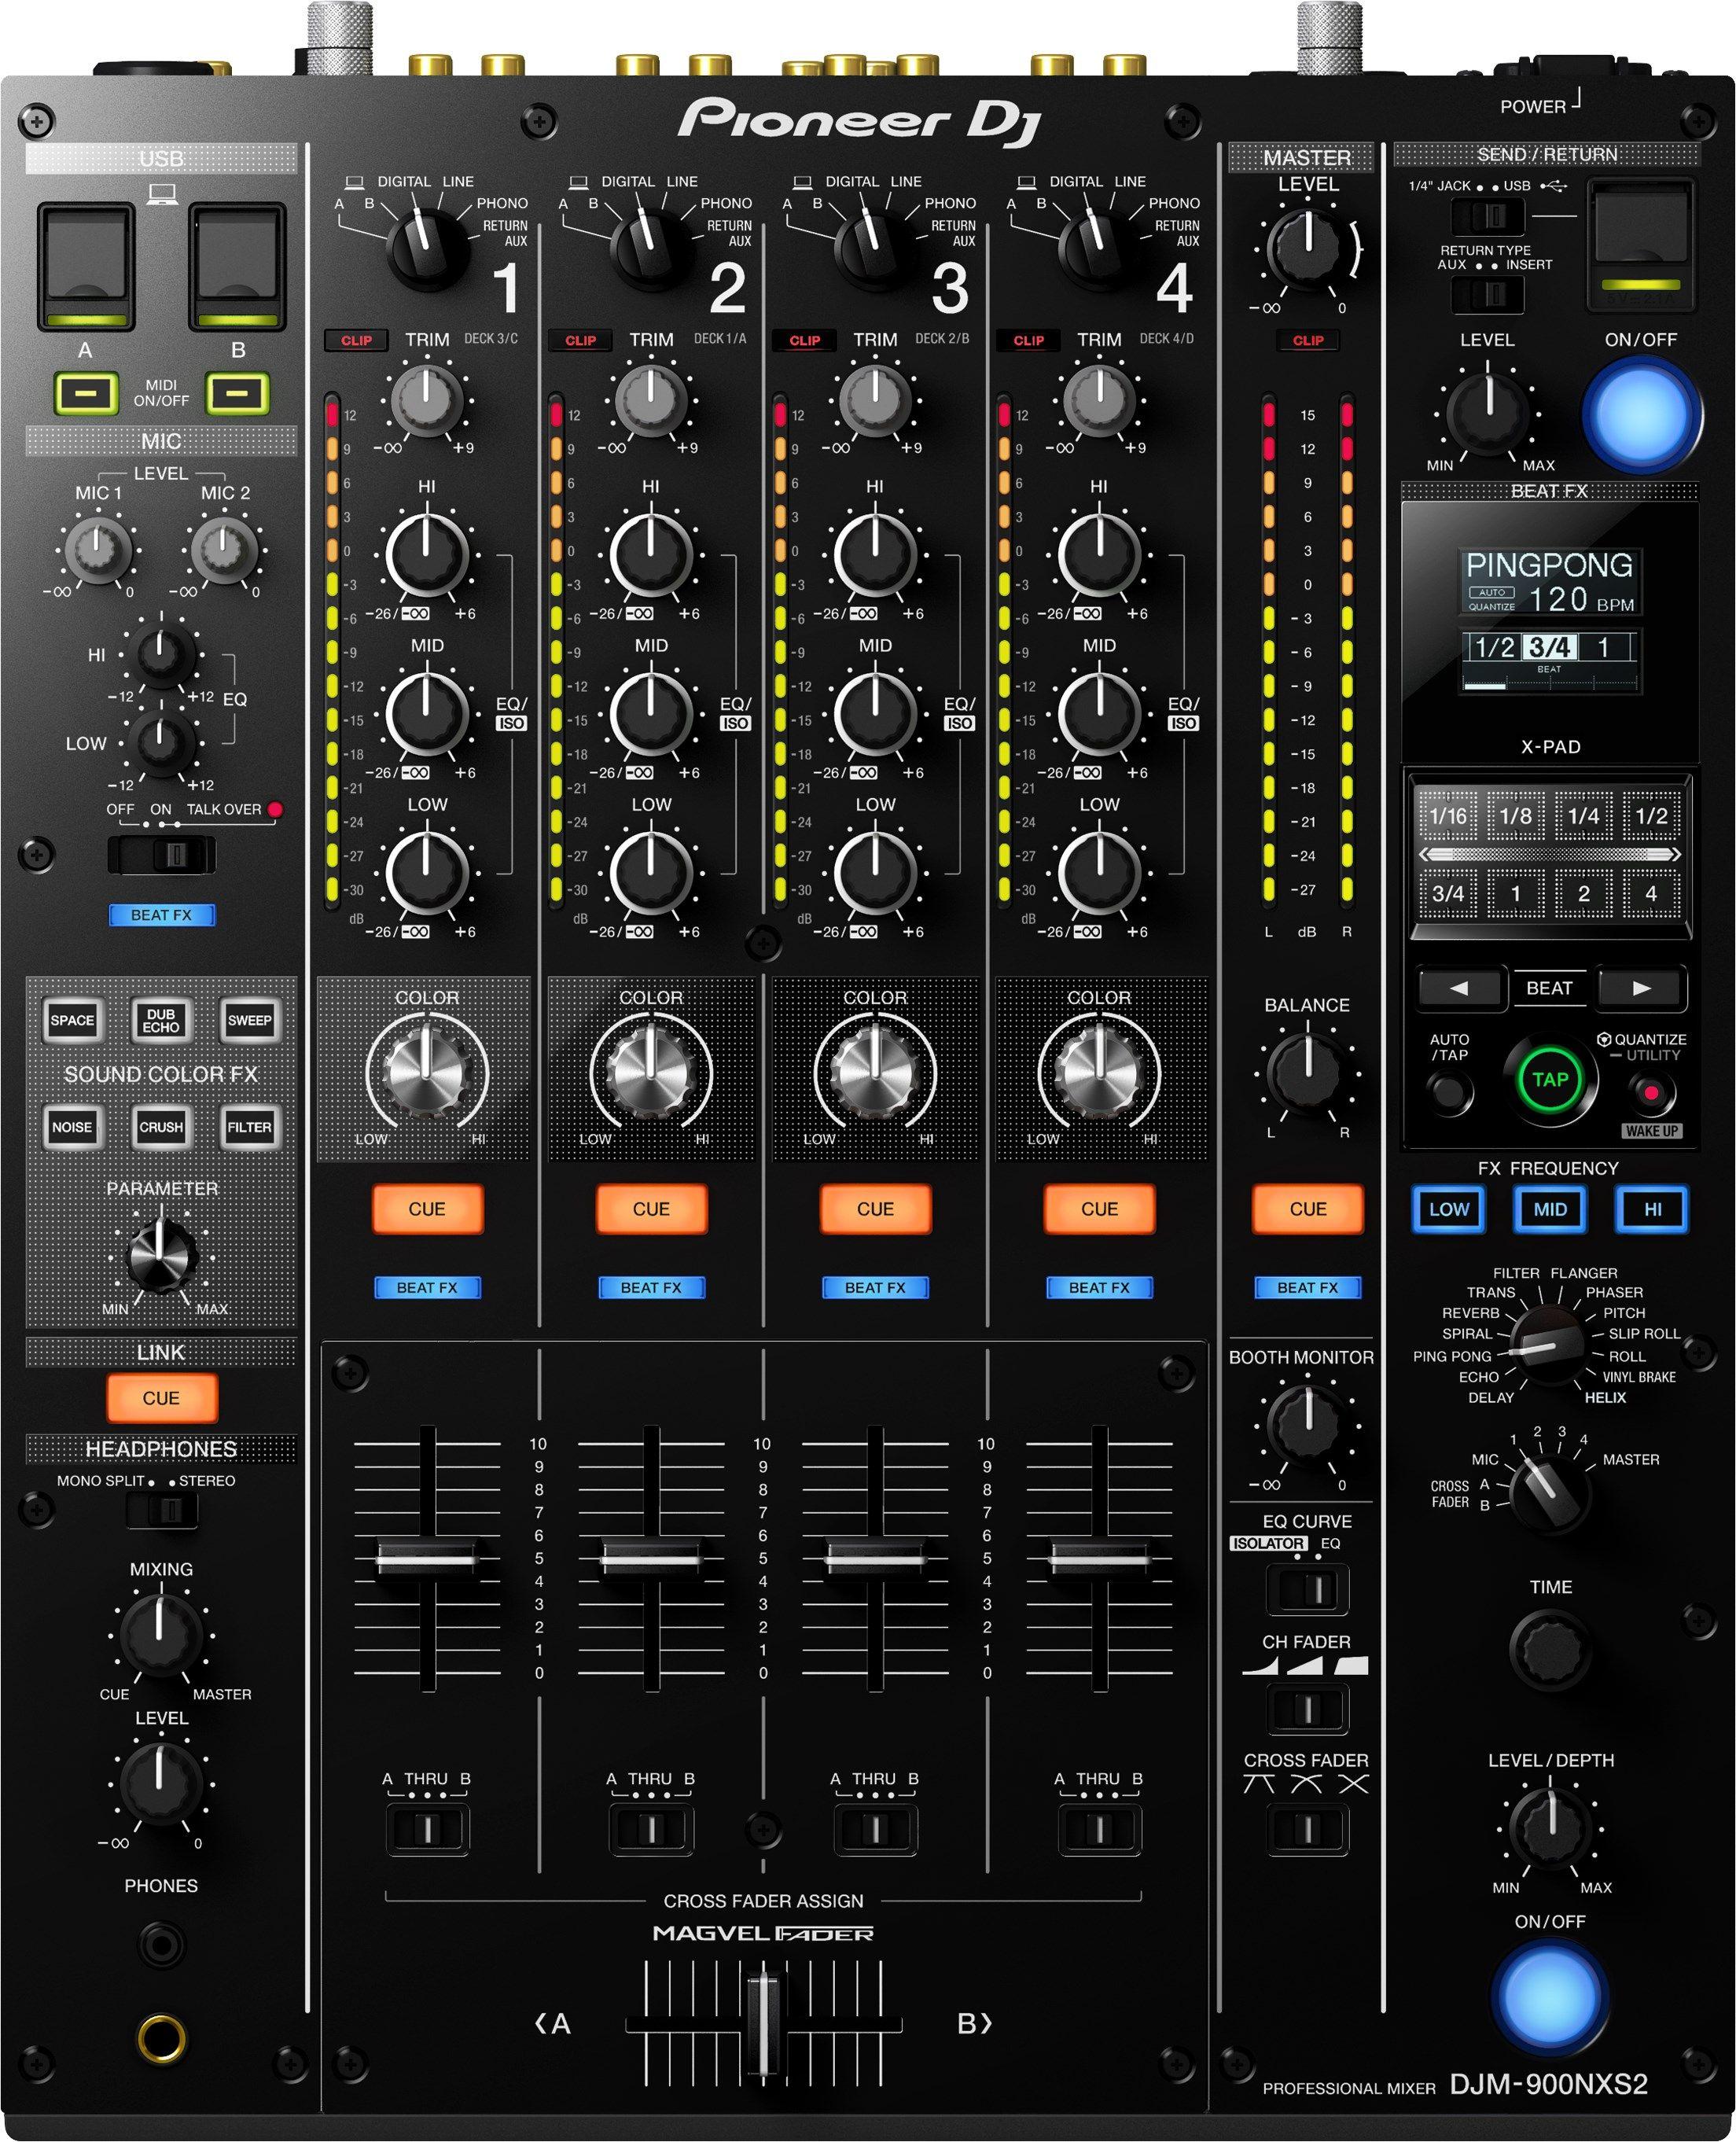 Epingle Par Dar1u5 Umbra5a5 Sur Dj Equipment Table De Mixage